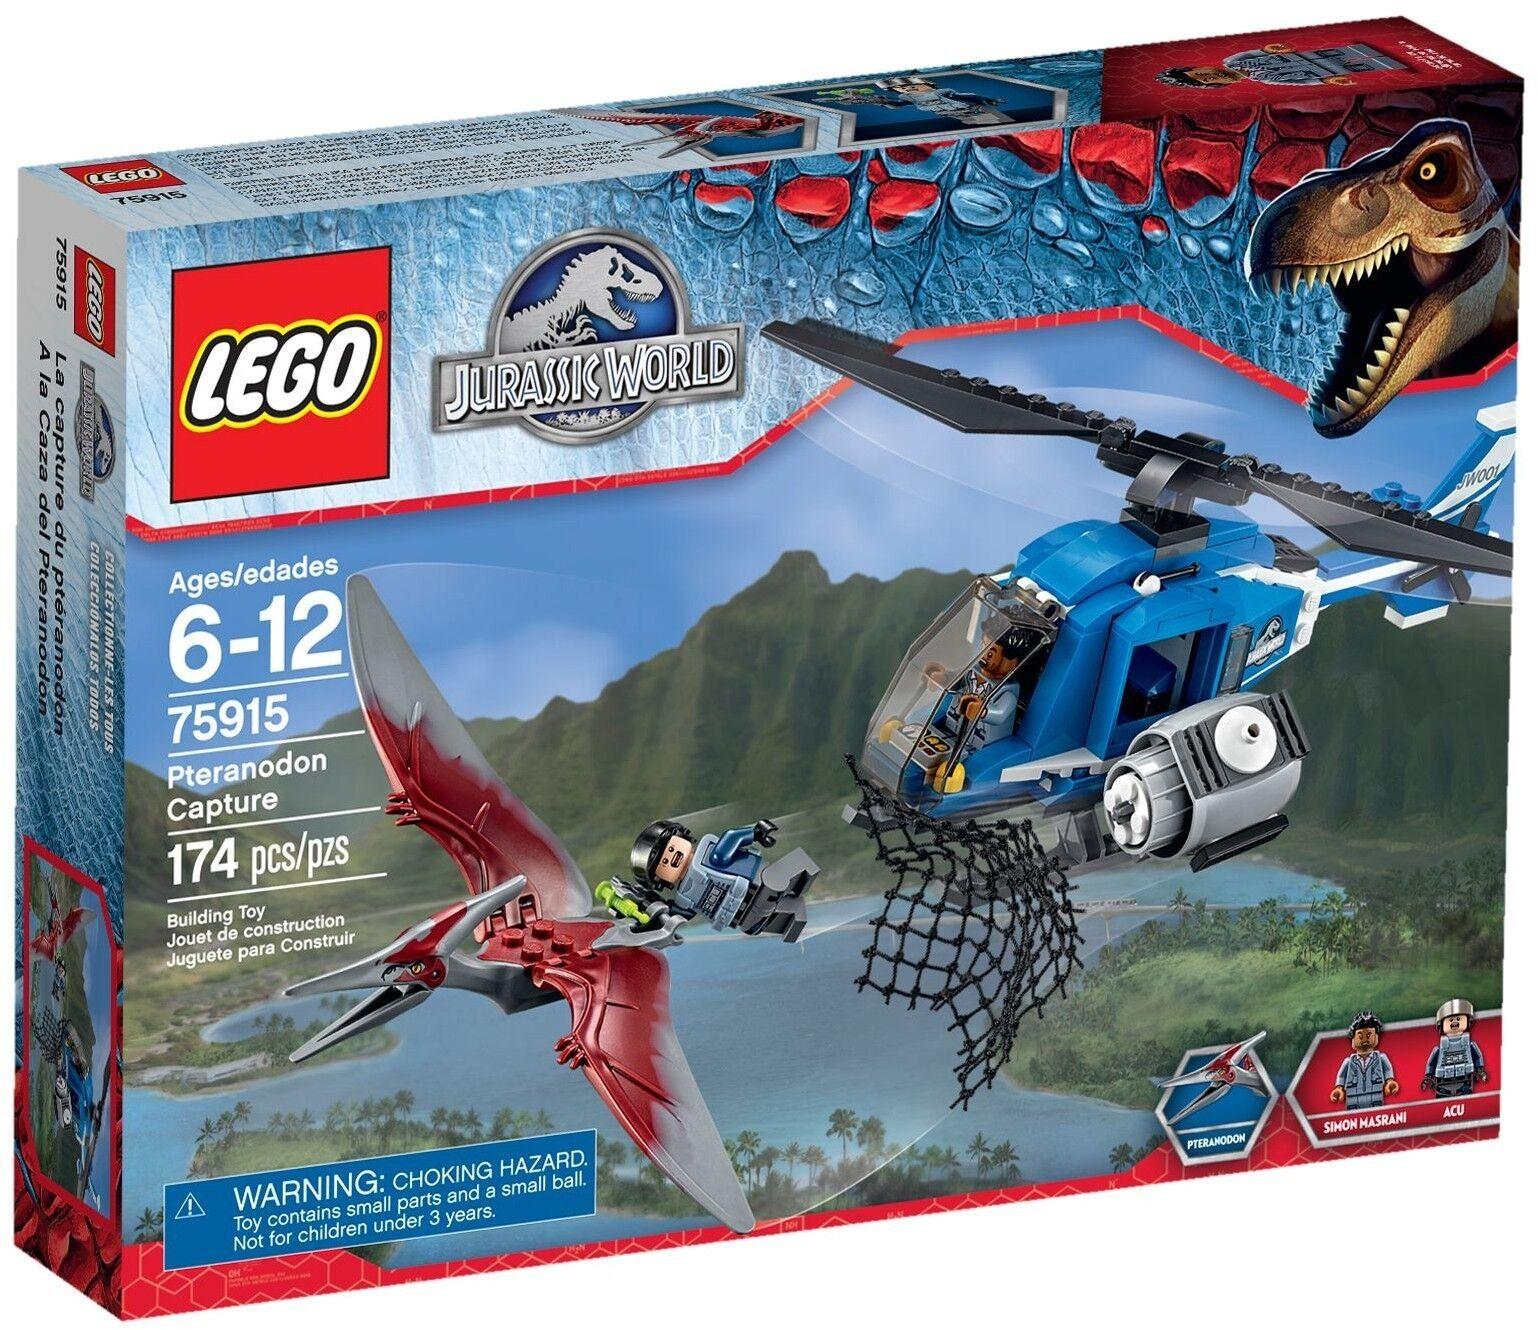 Lego Jurassic World 75915 PTERANODON Capture RARE RETIrouge ✔ Entièrement neuf dans sa boîte ✔ Neuf Scellé ✔